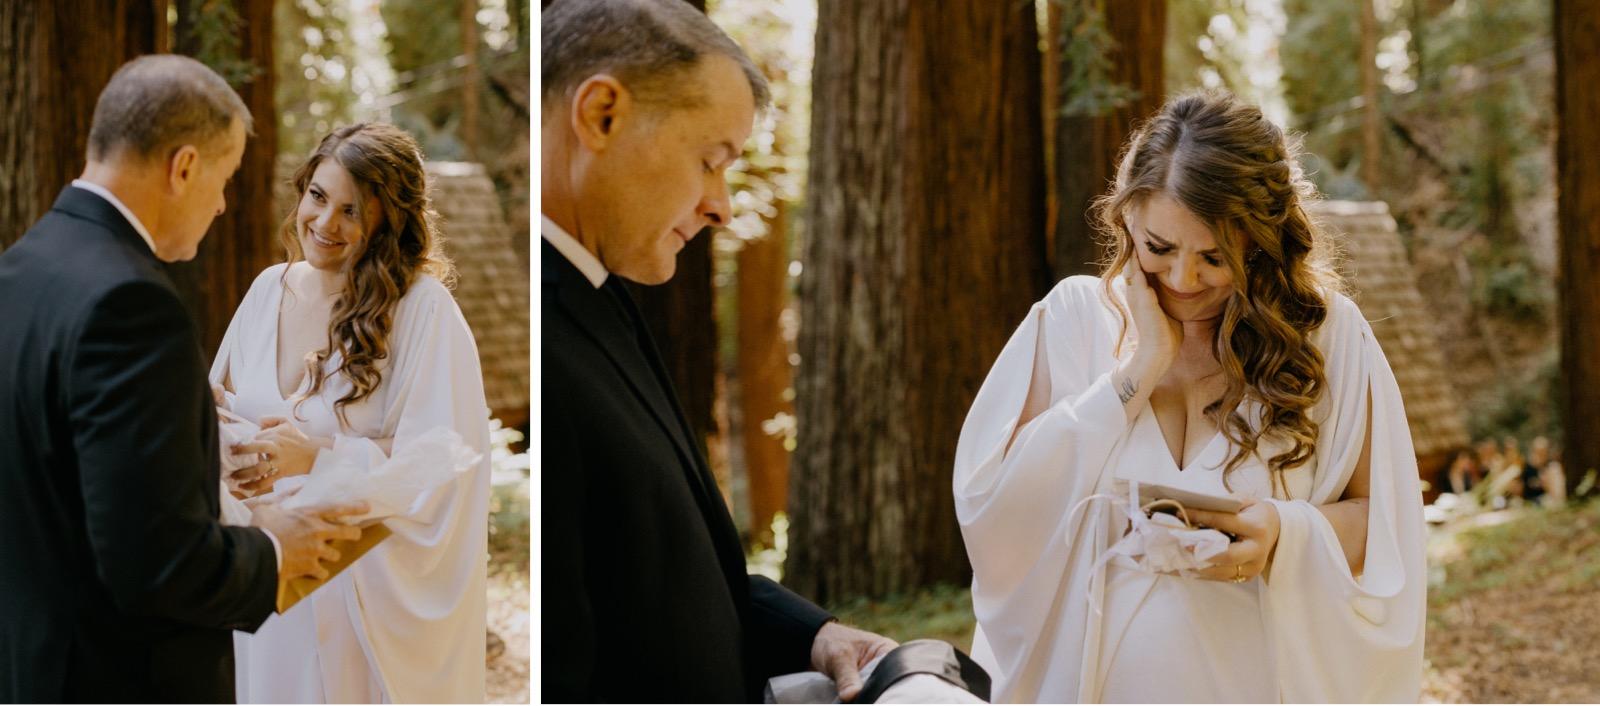 022_Emily & Jeff Wedding 0173_Emily & Jeff Wedding 0167_moments_bride_first-look_father_wedding